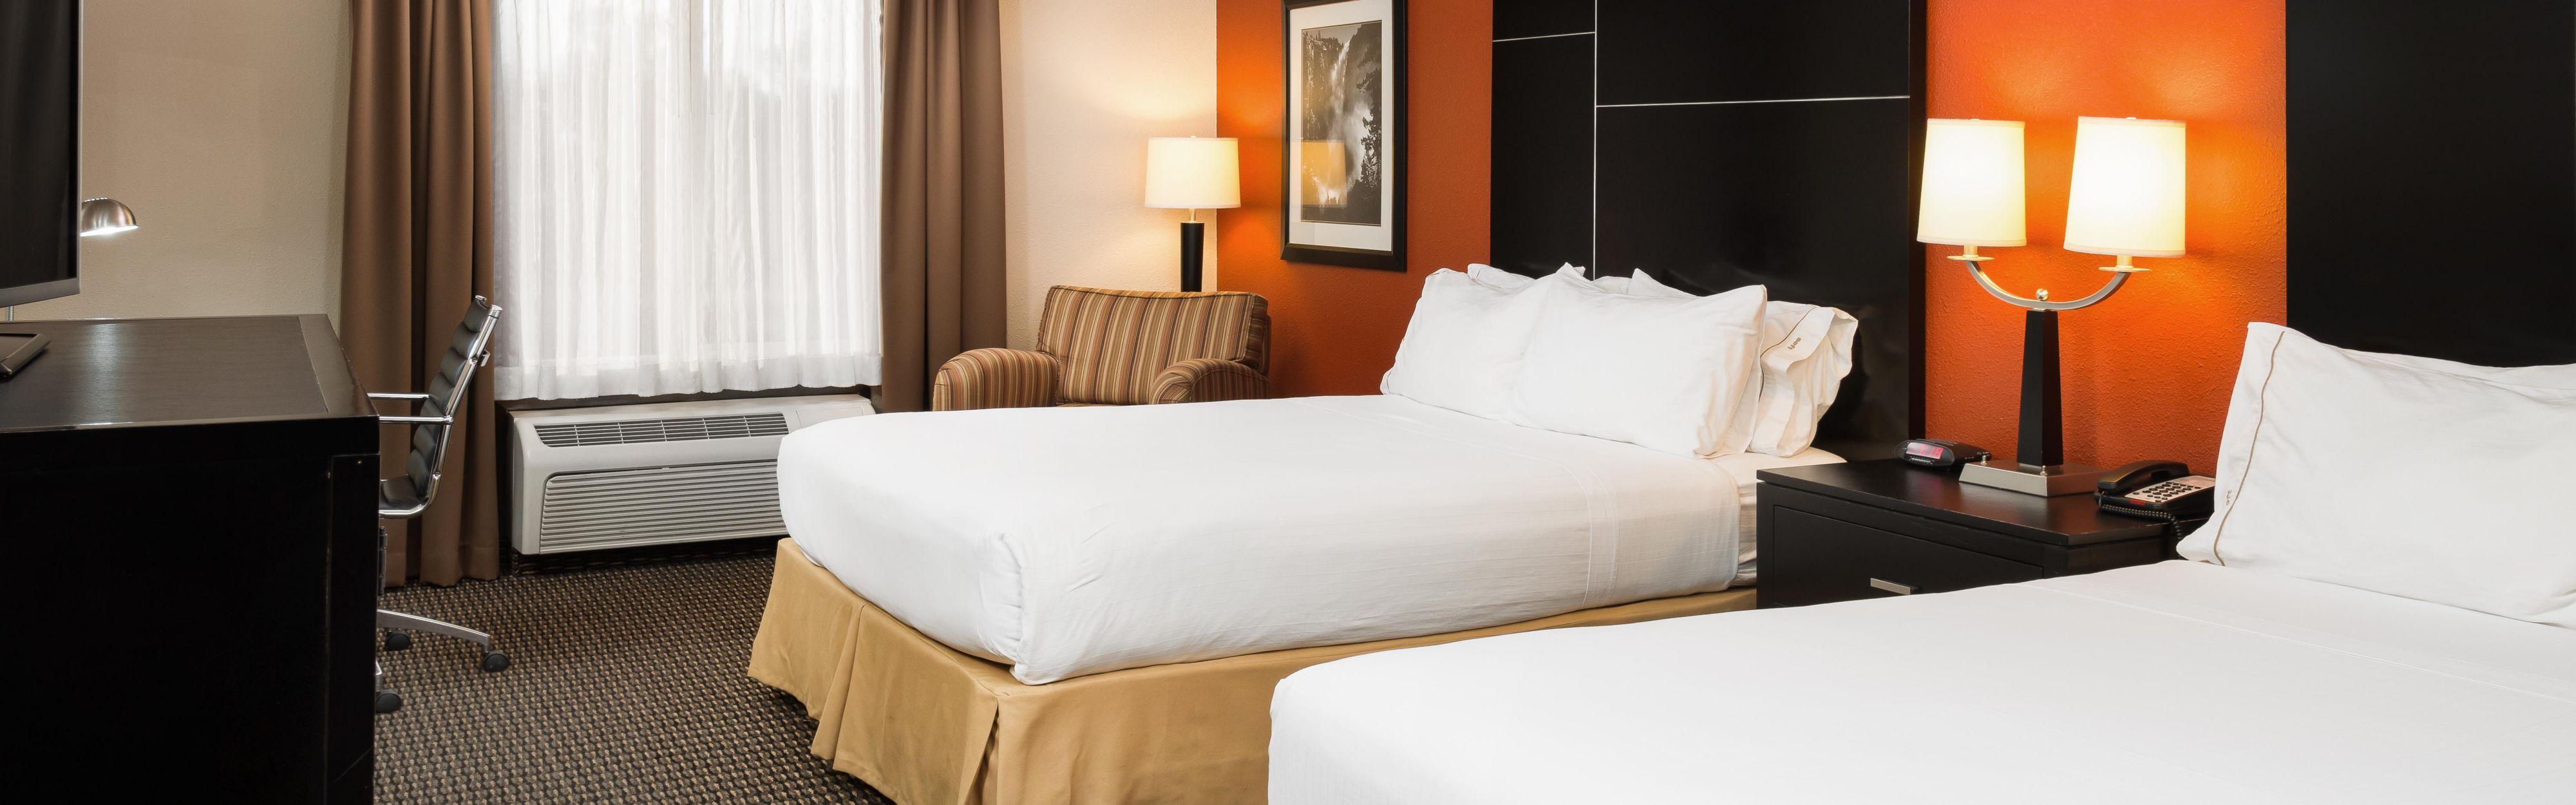 Holiday Inn Express & Suites Chowchilla - Yosemite Pk Area image 1